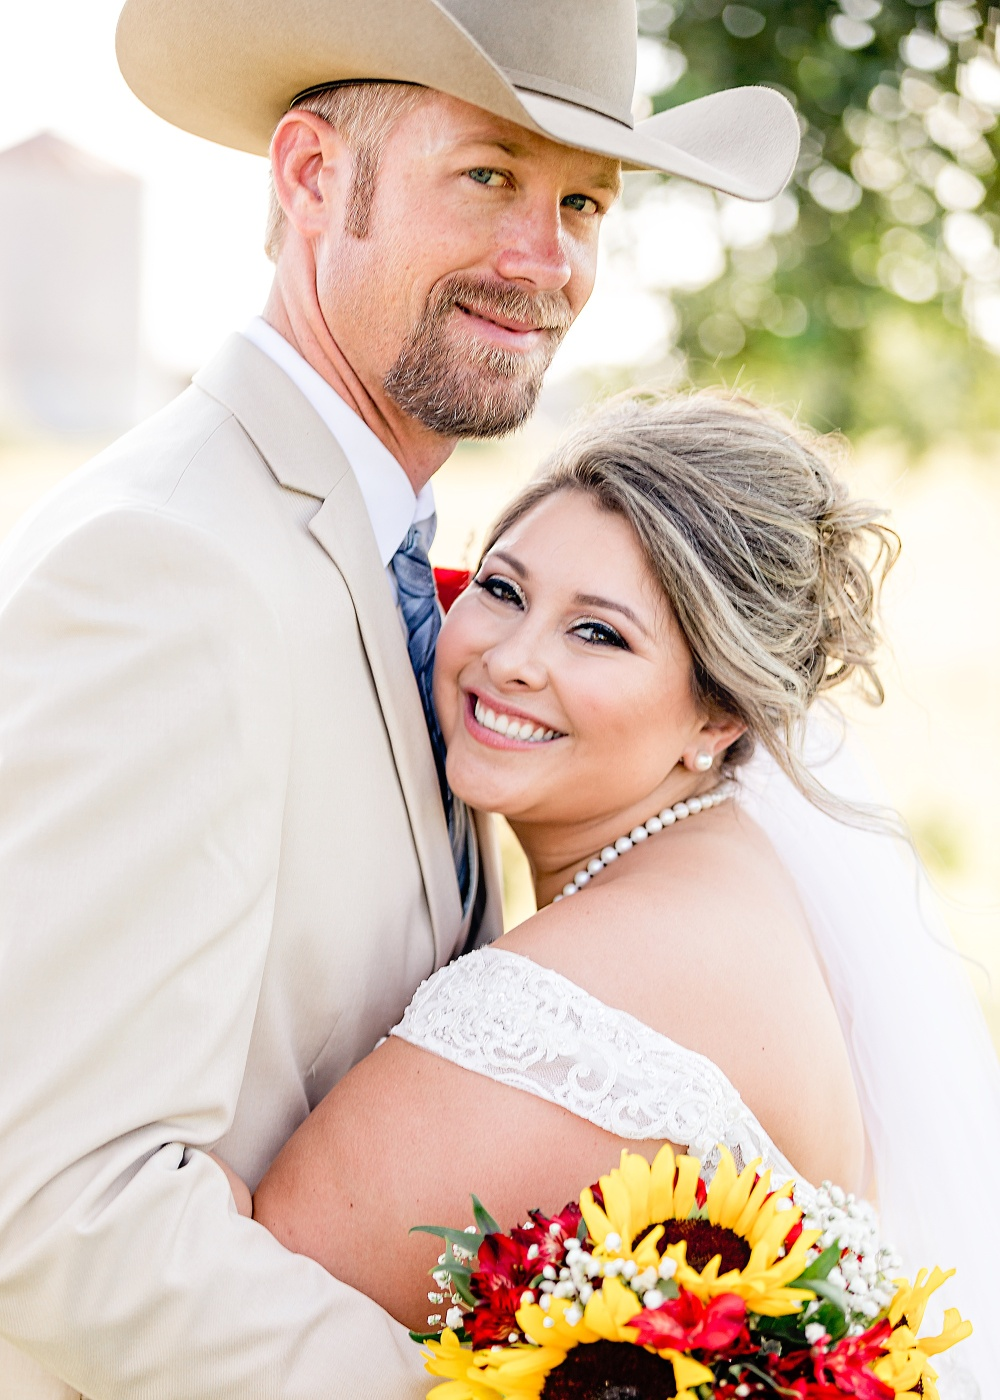 Wedding-Photographer-Rustic-Sunflower-theme-Texas-Carly-Barton-Photography_0116.jpg